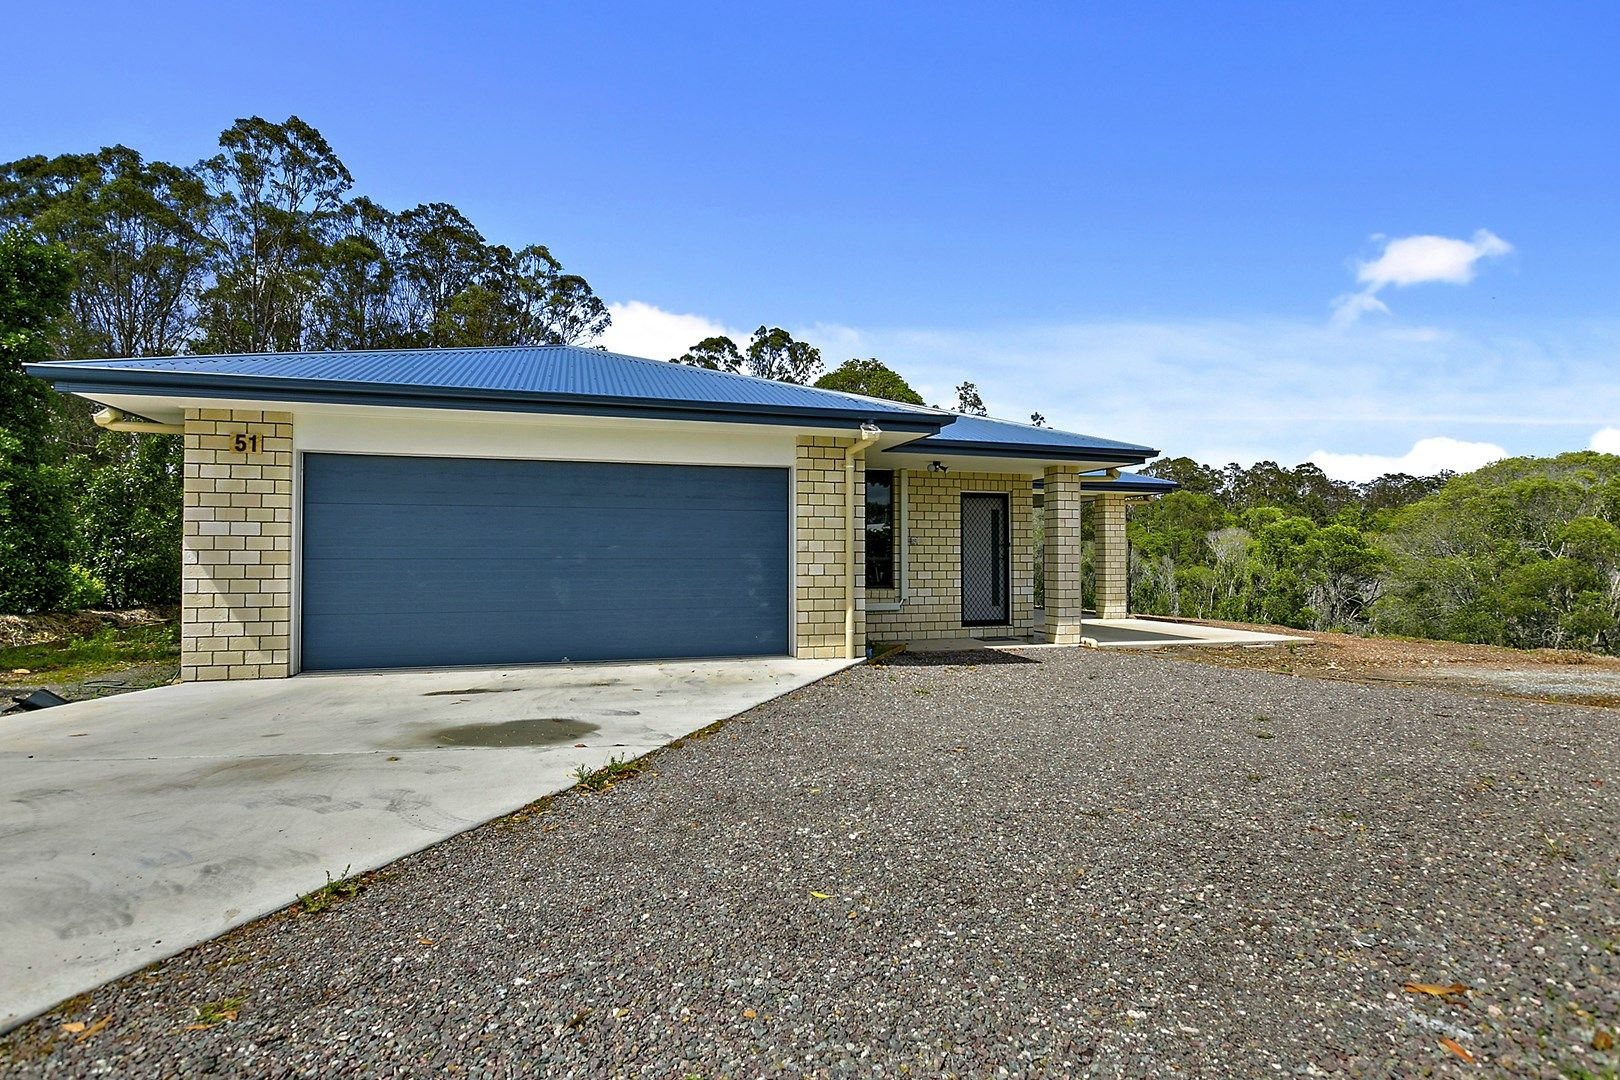 51 Wirruna Drive, Cooran QLD 4569, Image 0